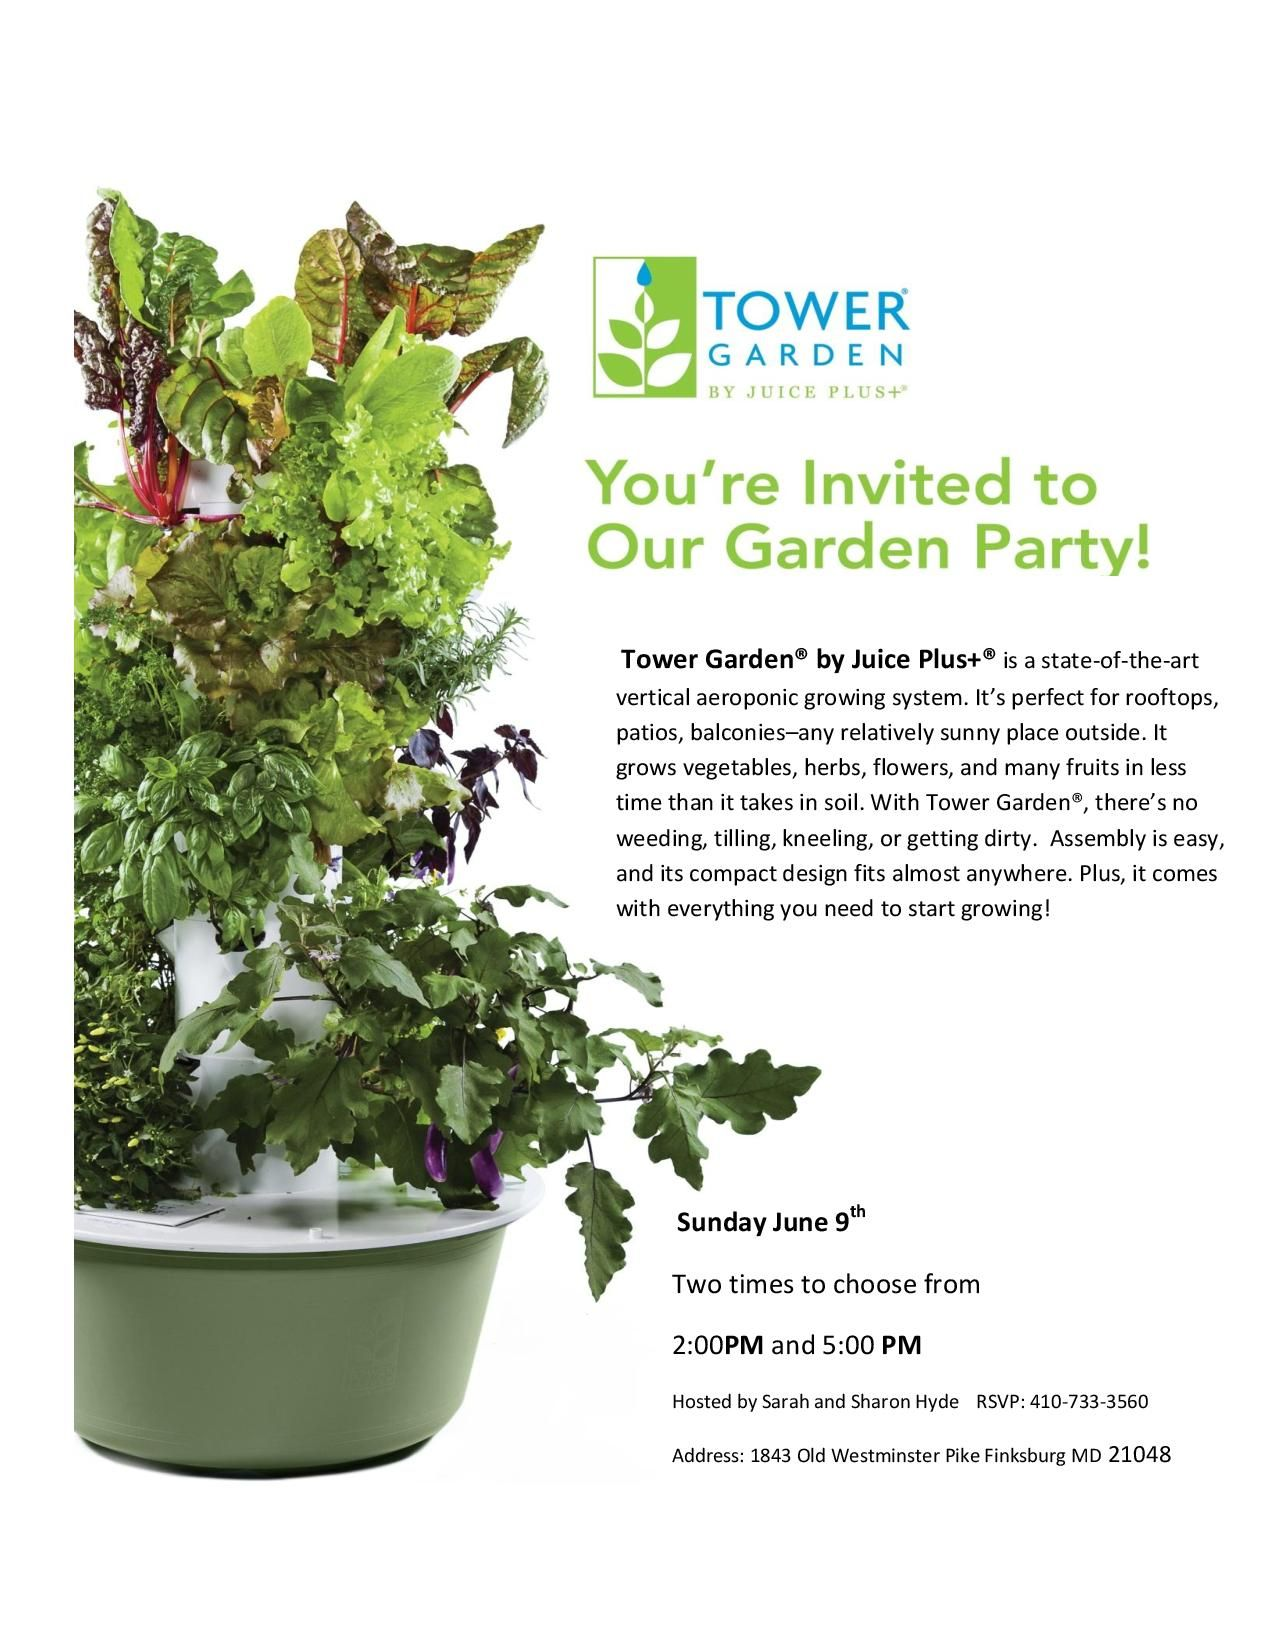 Tower Garden by Juice Plus Vertical Garden Garden